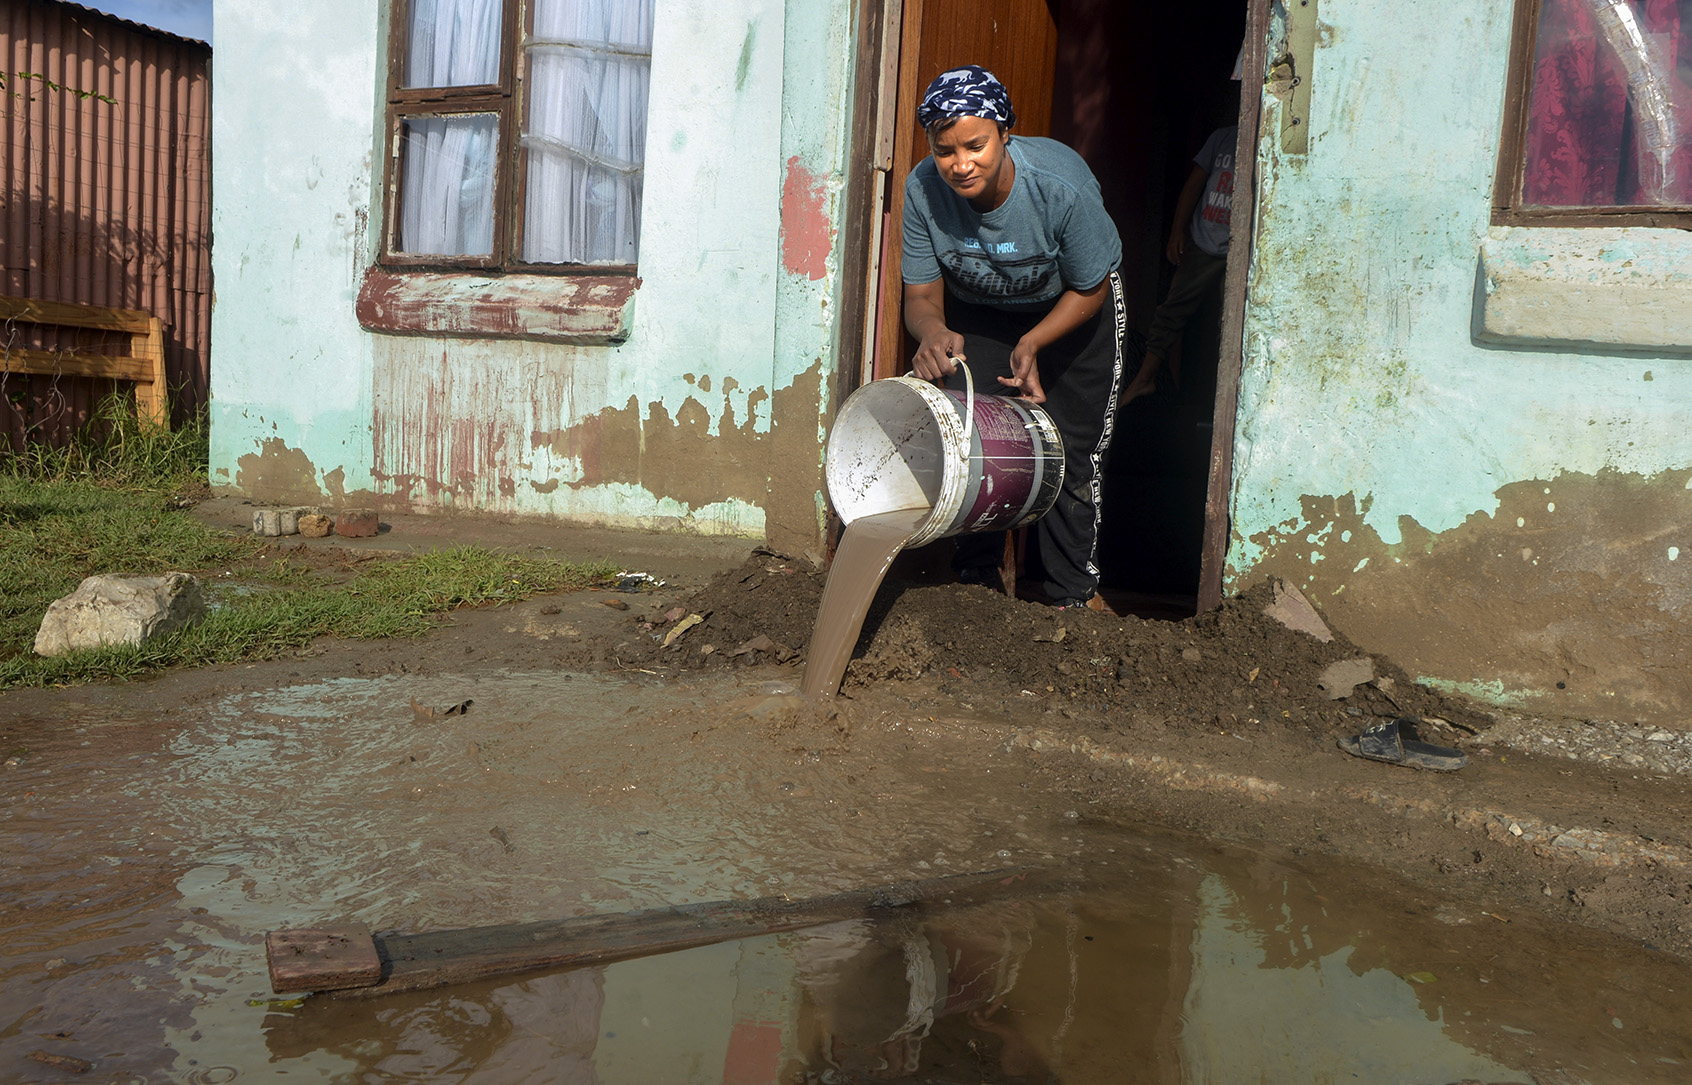 MAVERICK CITIZEN : Winter storm brings some relief to Nelson Mandela Bay water crisis despite widespread flooding